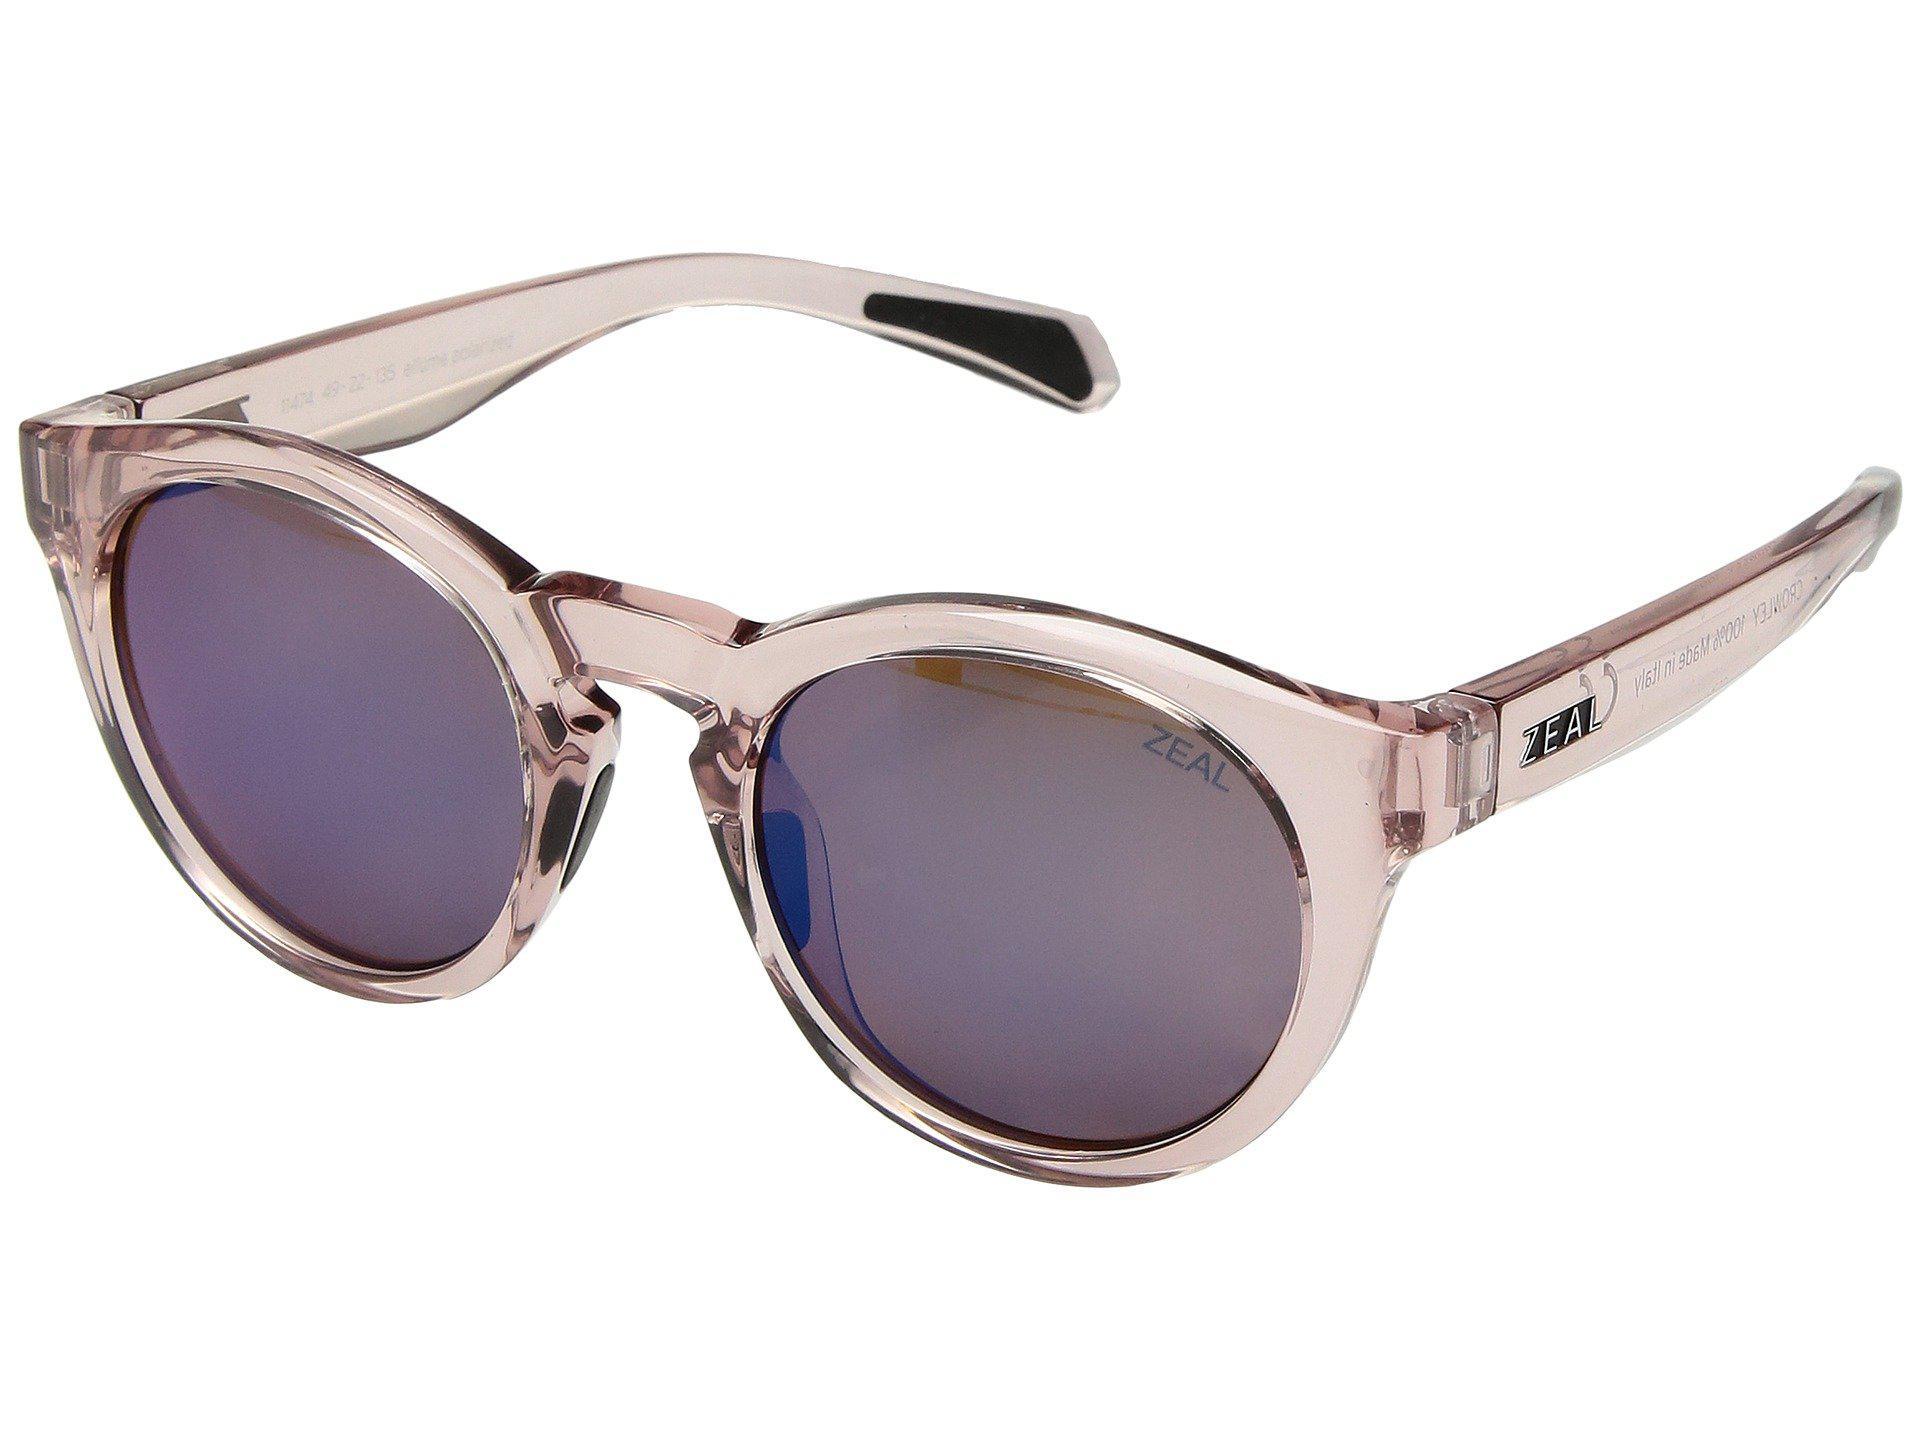 fae728e8d1 Zeal Optics. Women s Crowley (ivory Tortoise polarized Copper Lens) Athletic  Performance Sport Sunglasses